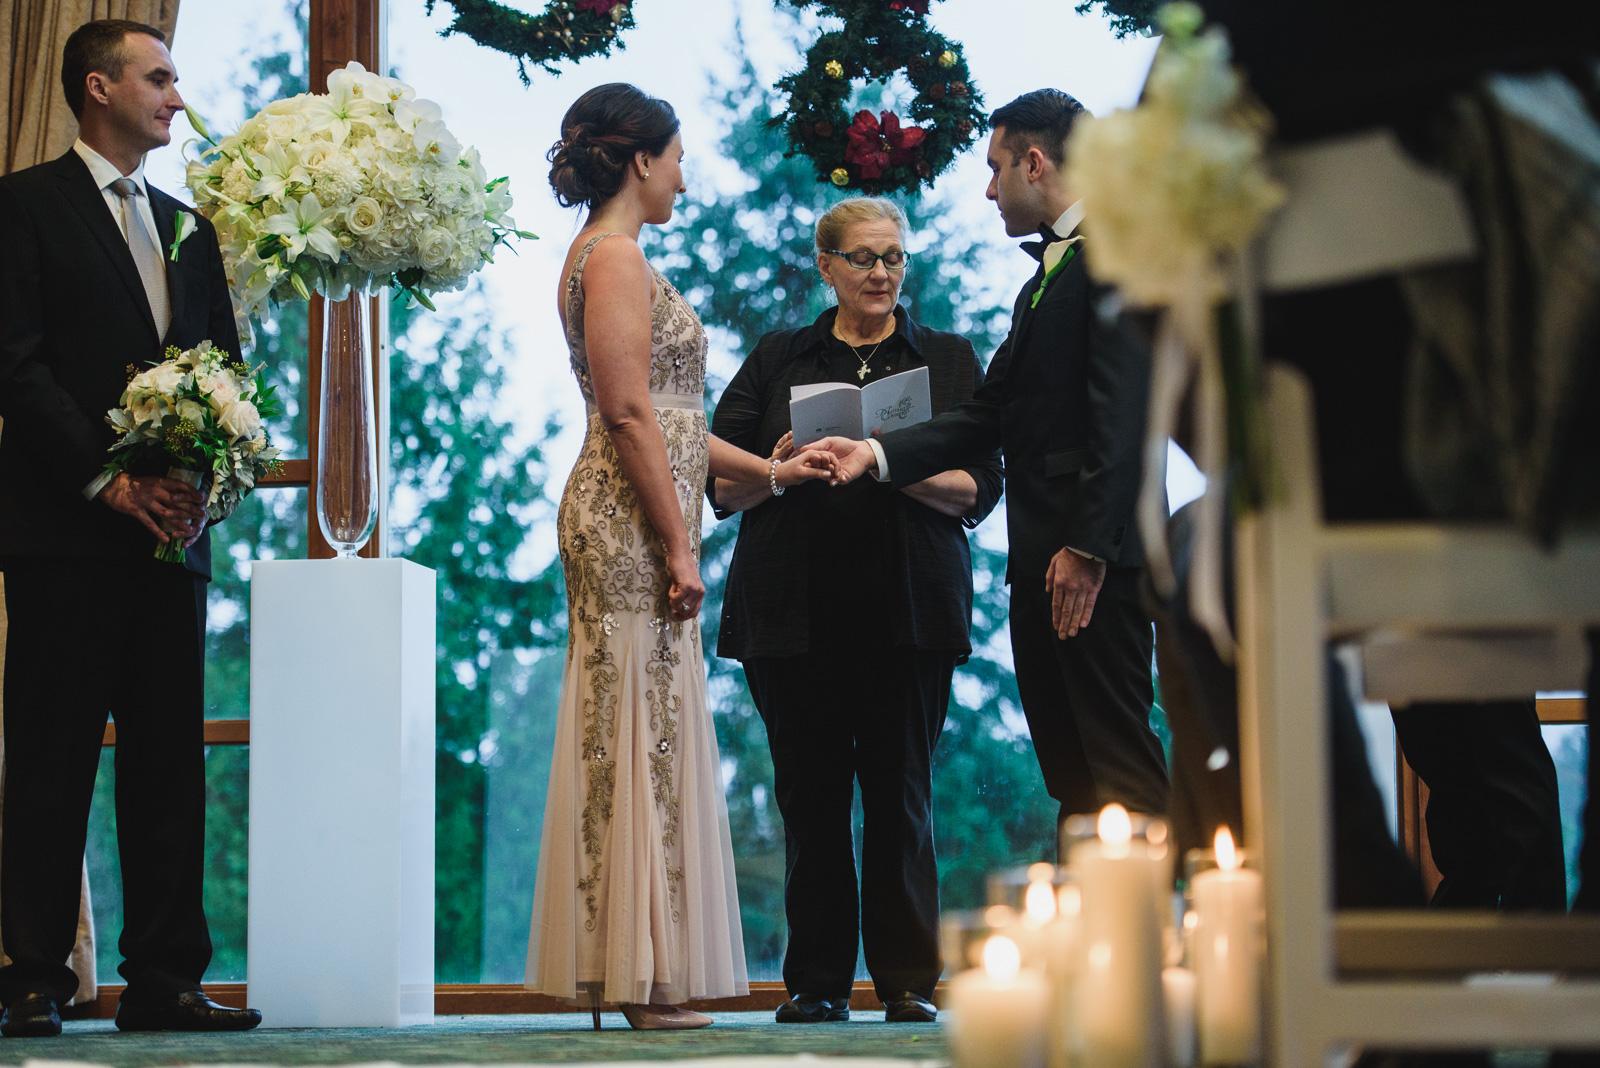 victoria-wedding-photographer-westwood-plateau-wedding-7.jpg